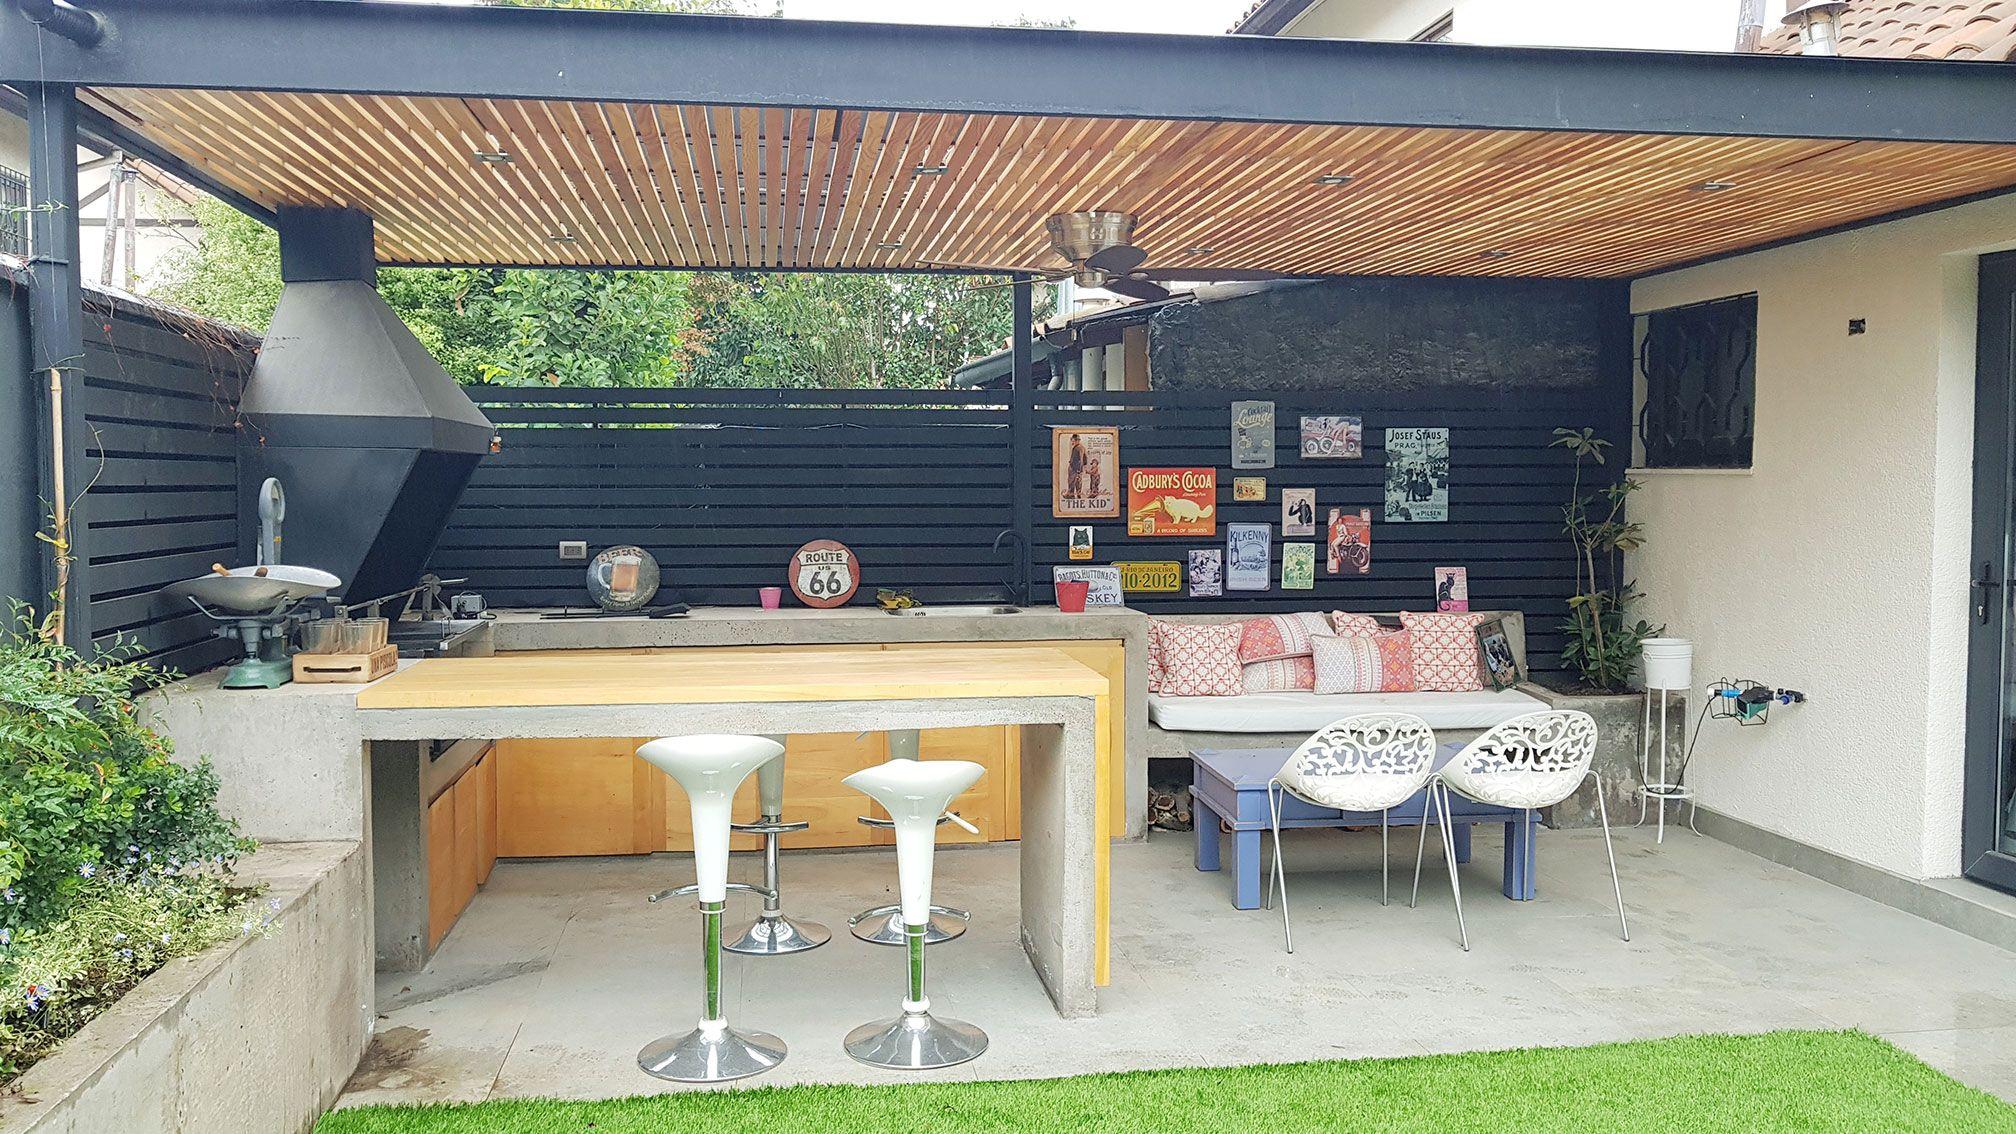 Pin De Abhinaya Srinitha En Outdoor Kitchen En 2020 Quinchos